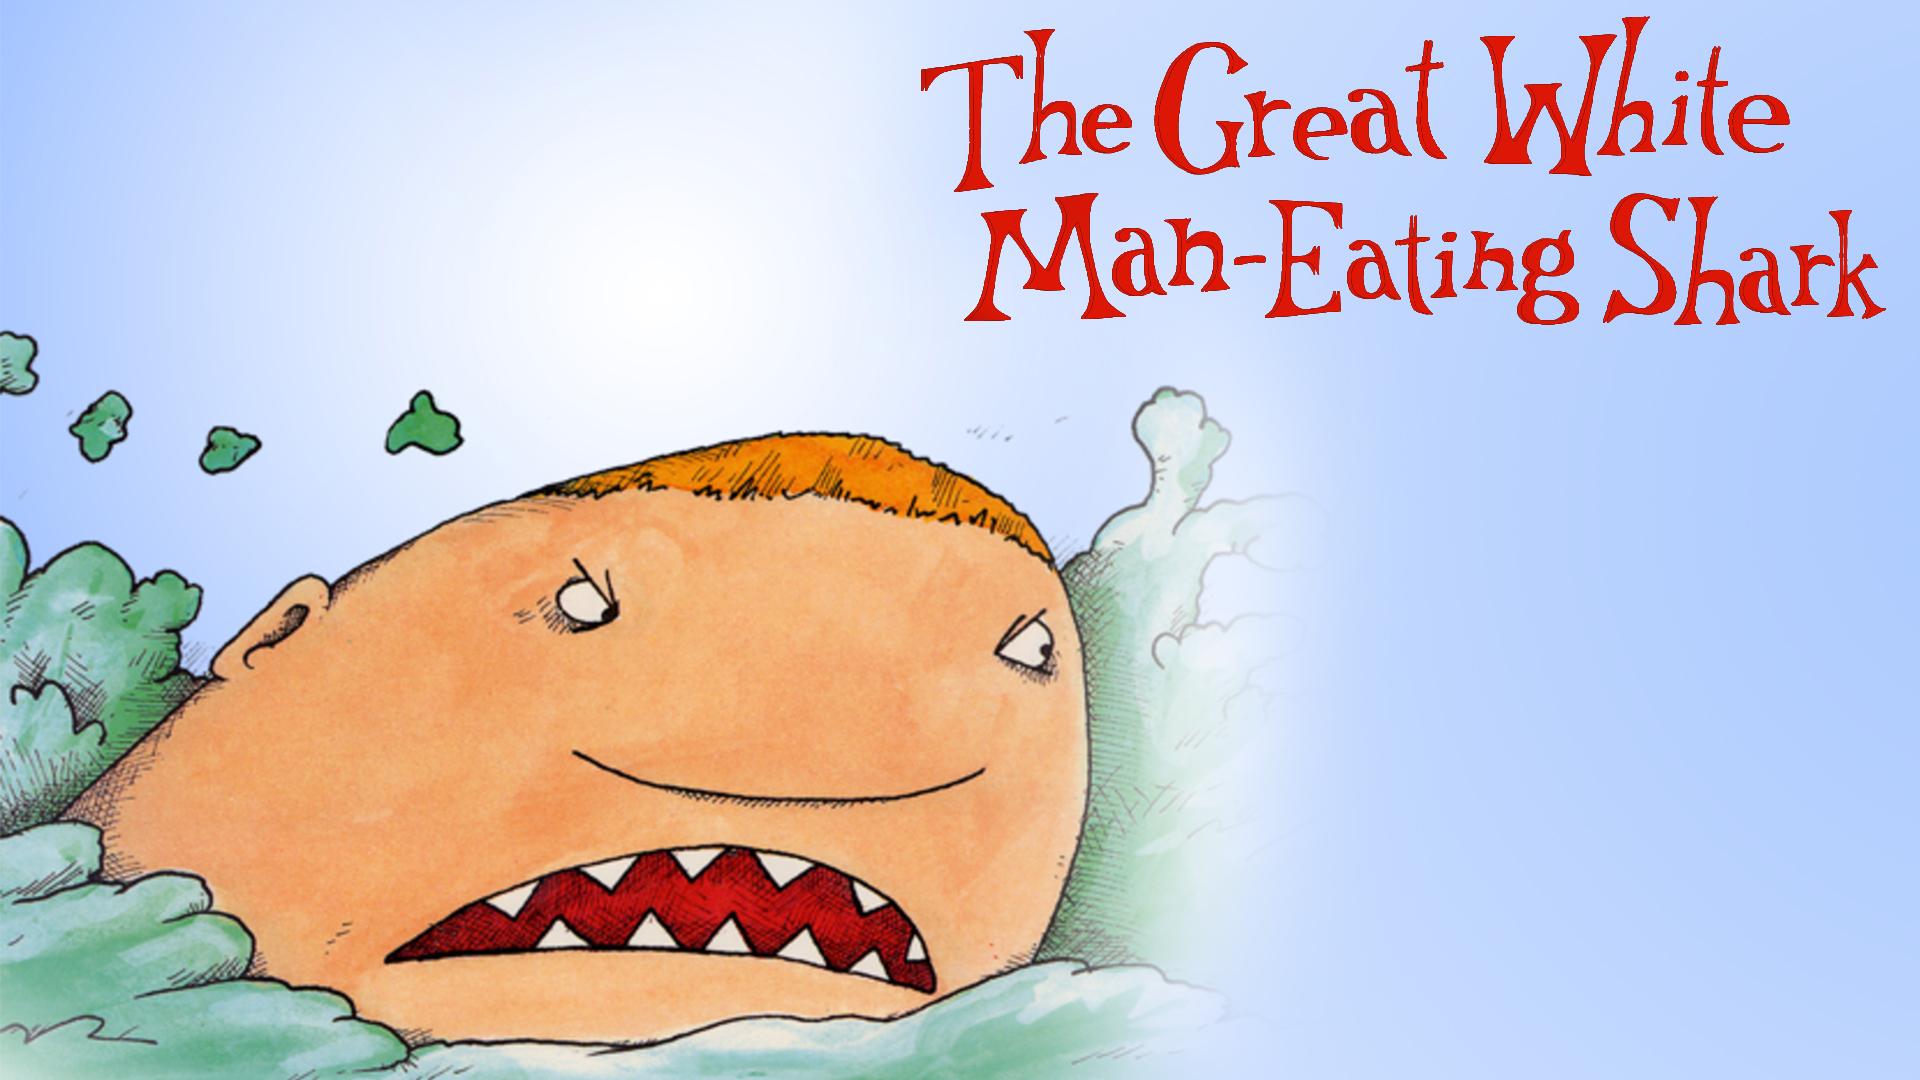 The Great White Man-Eating Shark